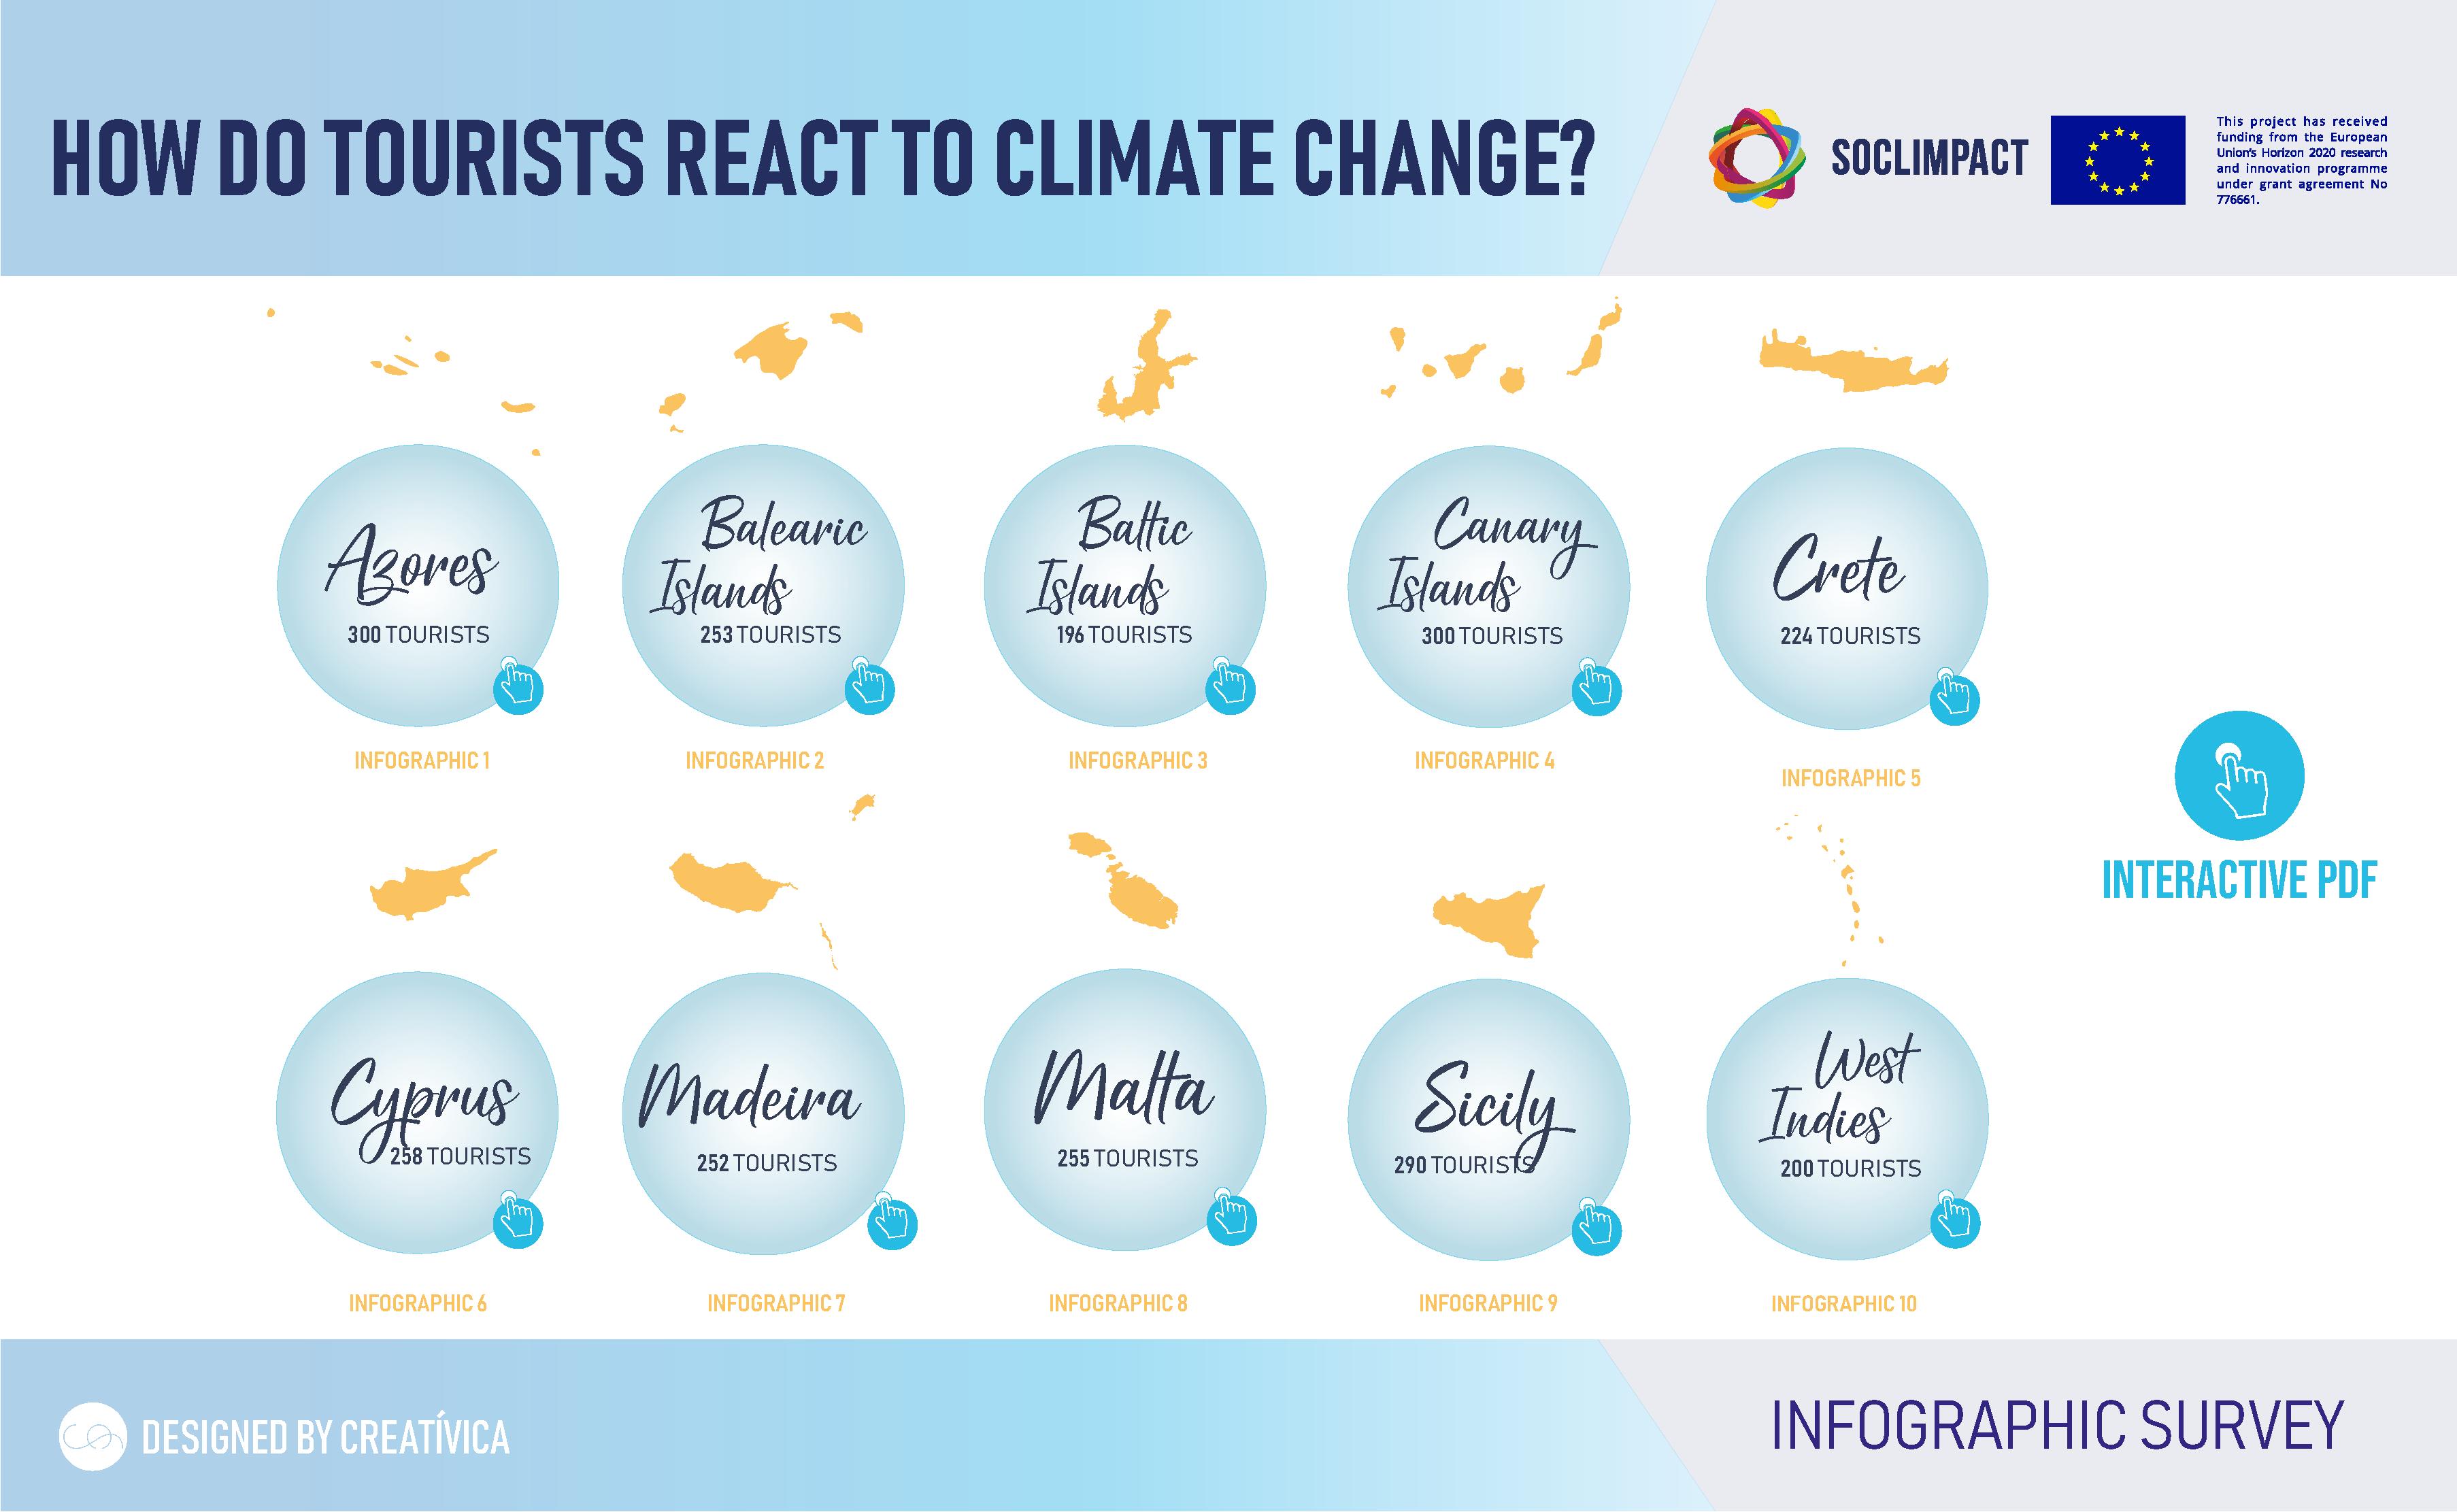 HOW DO TOURISTS REACT TO CLIMATE CHANGE?